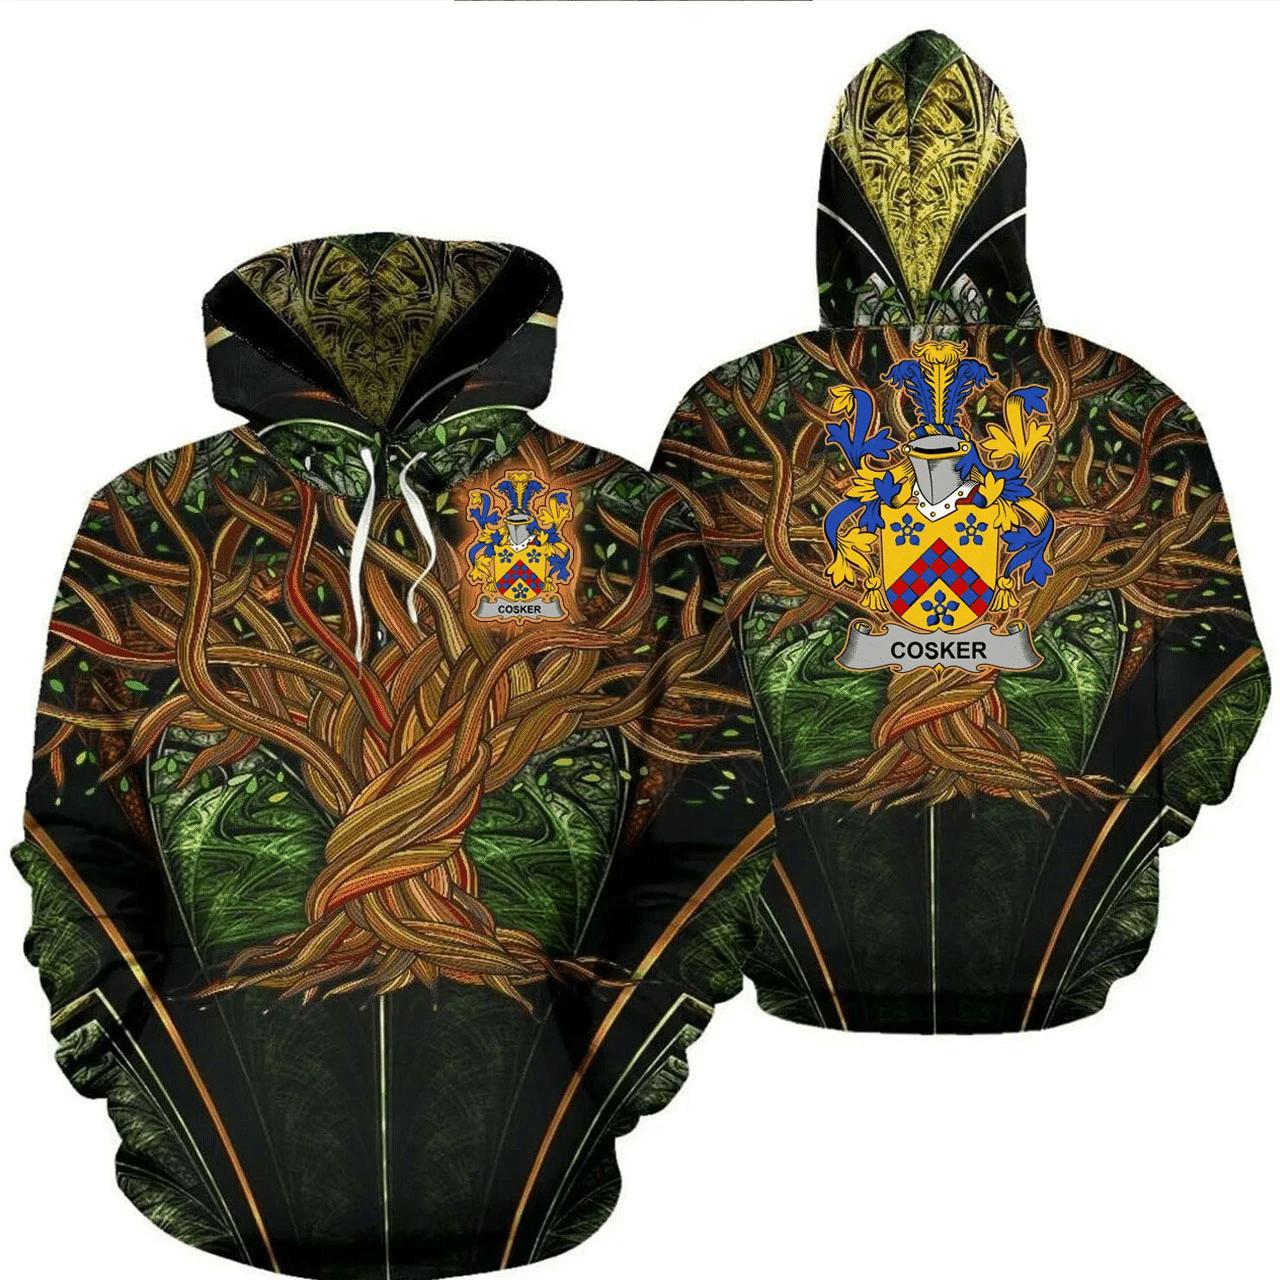 1stIreland Ireland Hoodie - Cosker or McCosker Irish Family Crest Hoodie - Tree Of Life A7